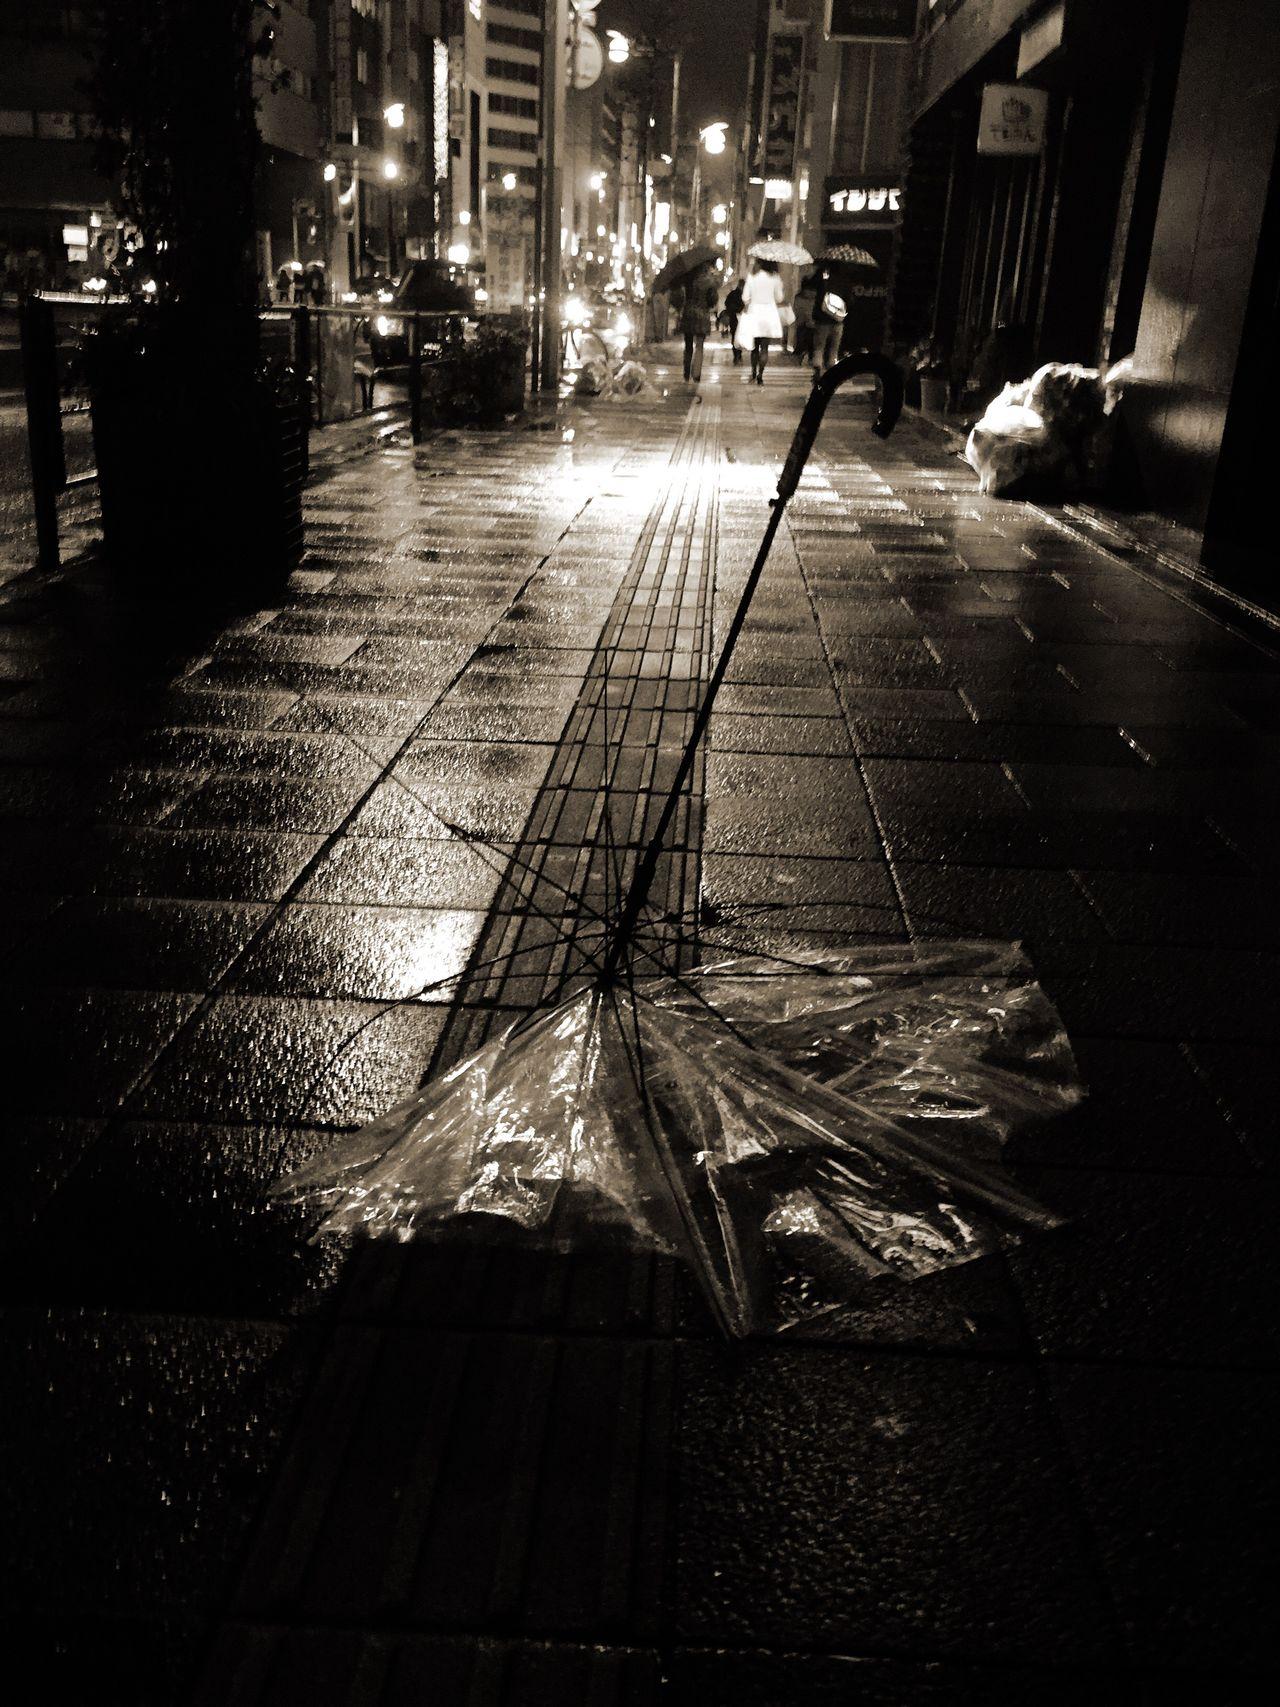 City Street Wet Night Architecture Rain City Life Japan Photography Japan Blackandwhite Black And White Black & White